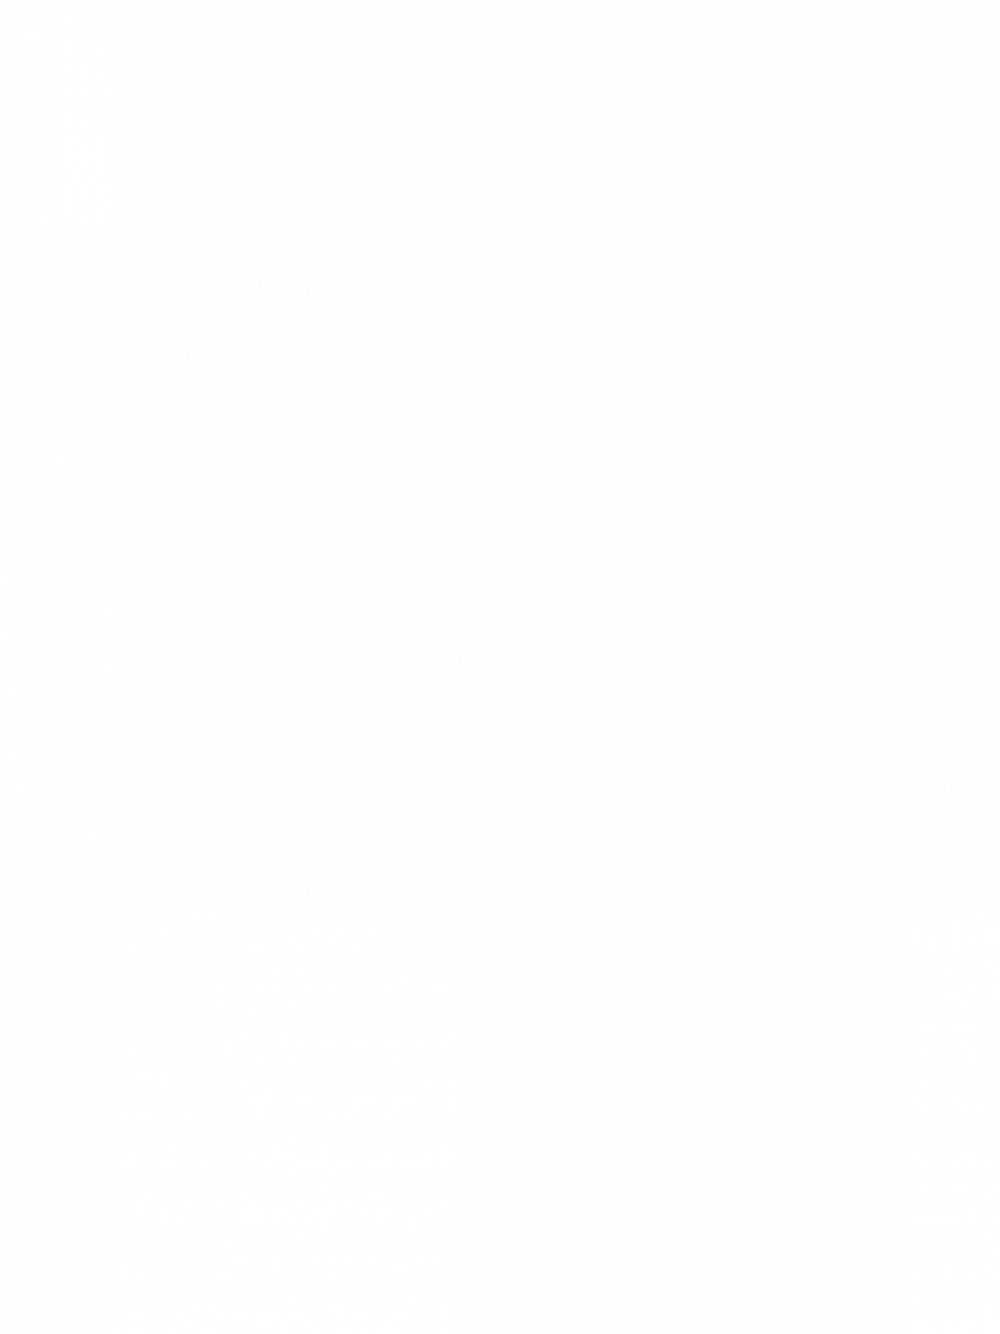 Seizoensafsluiter met Silicon Toernooi